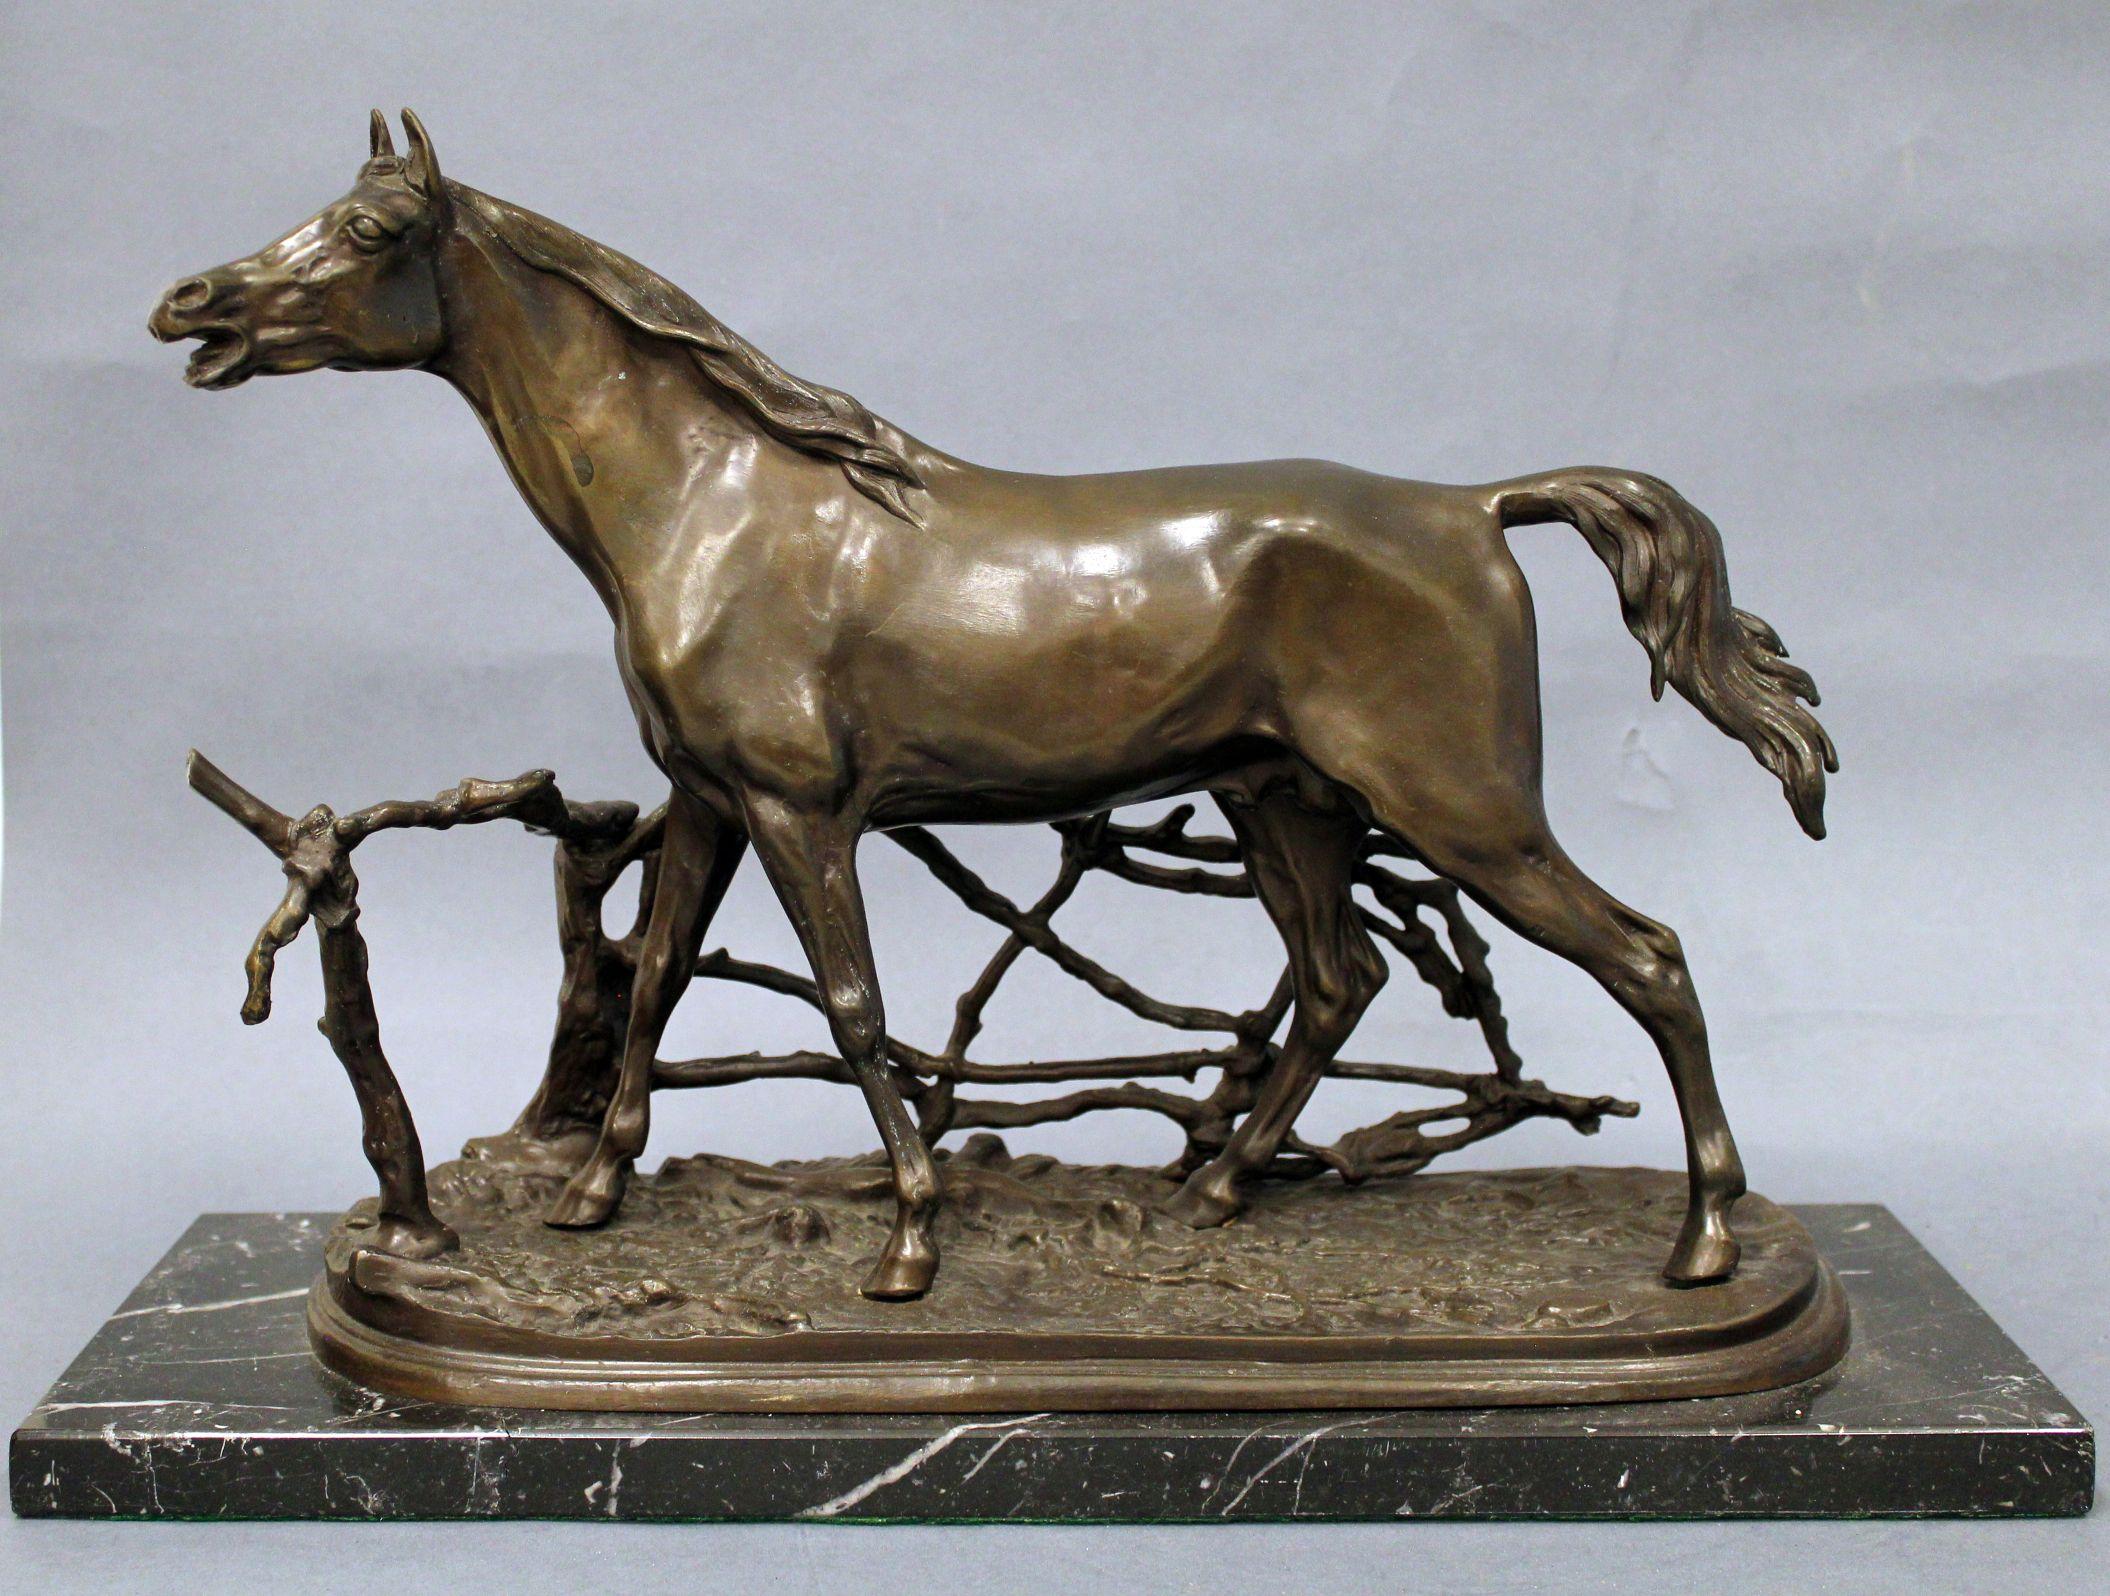 sculpture of a horse